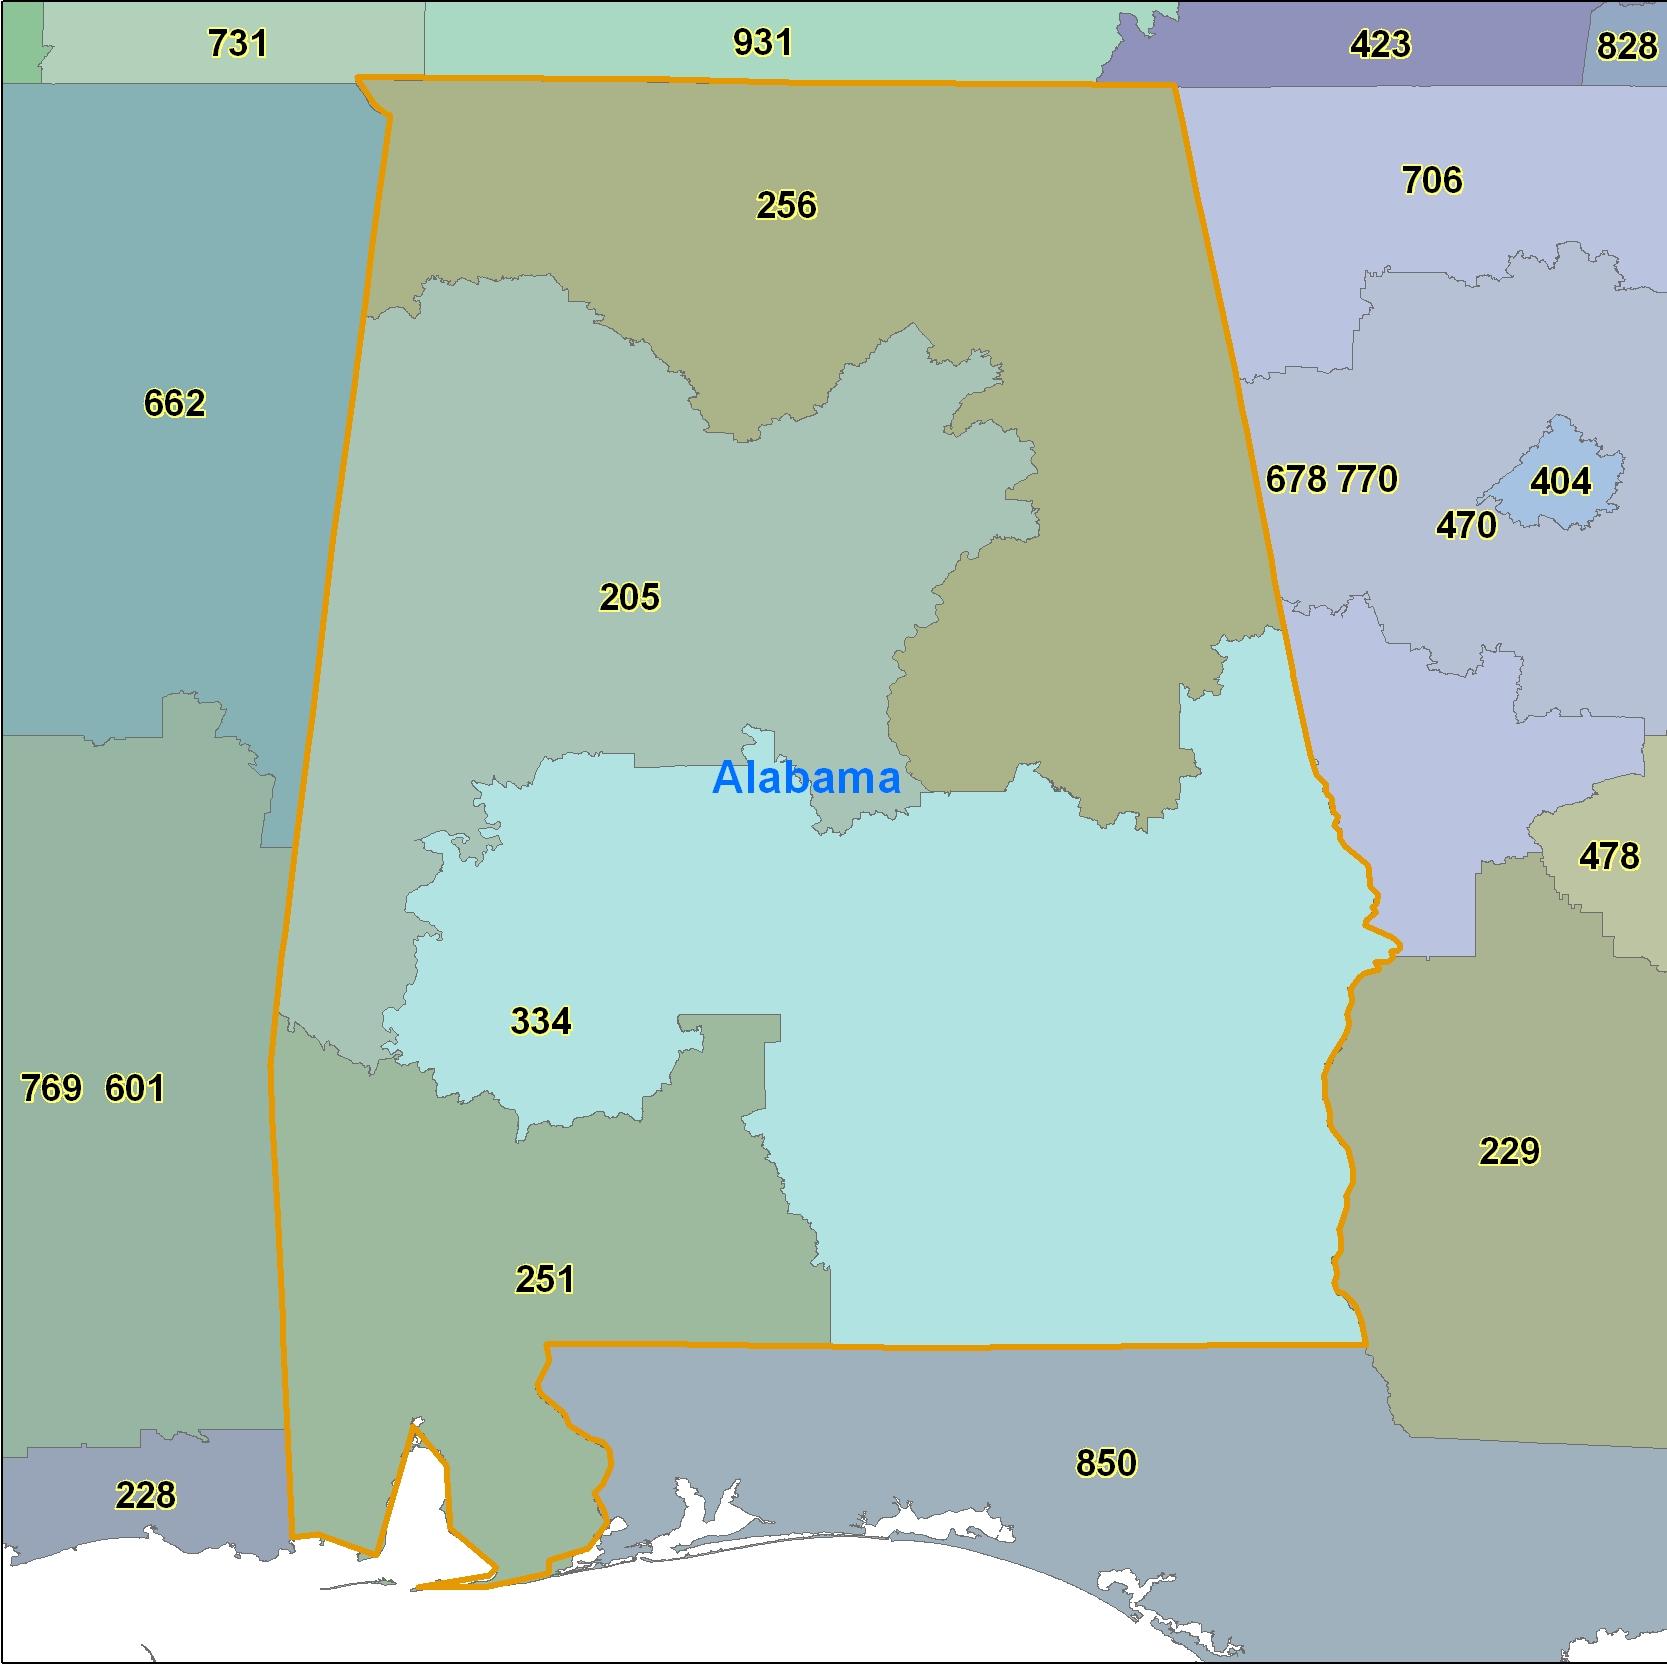 Alabama Area Code Maps -Alabama Telephone Area Code Maps- Free ...